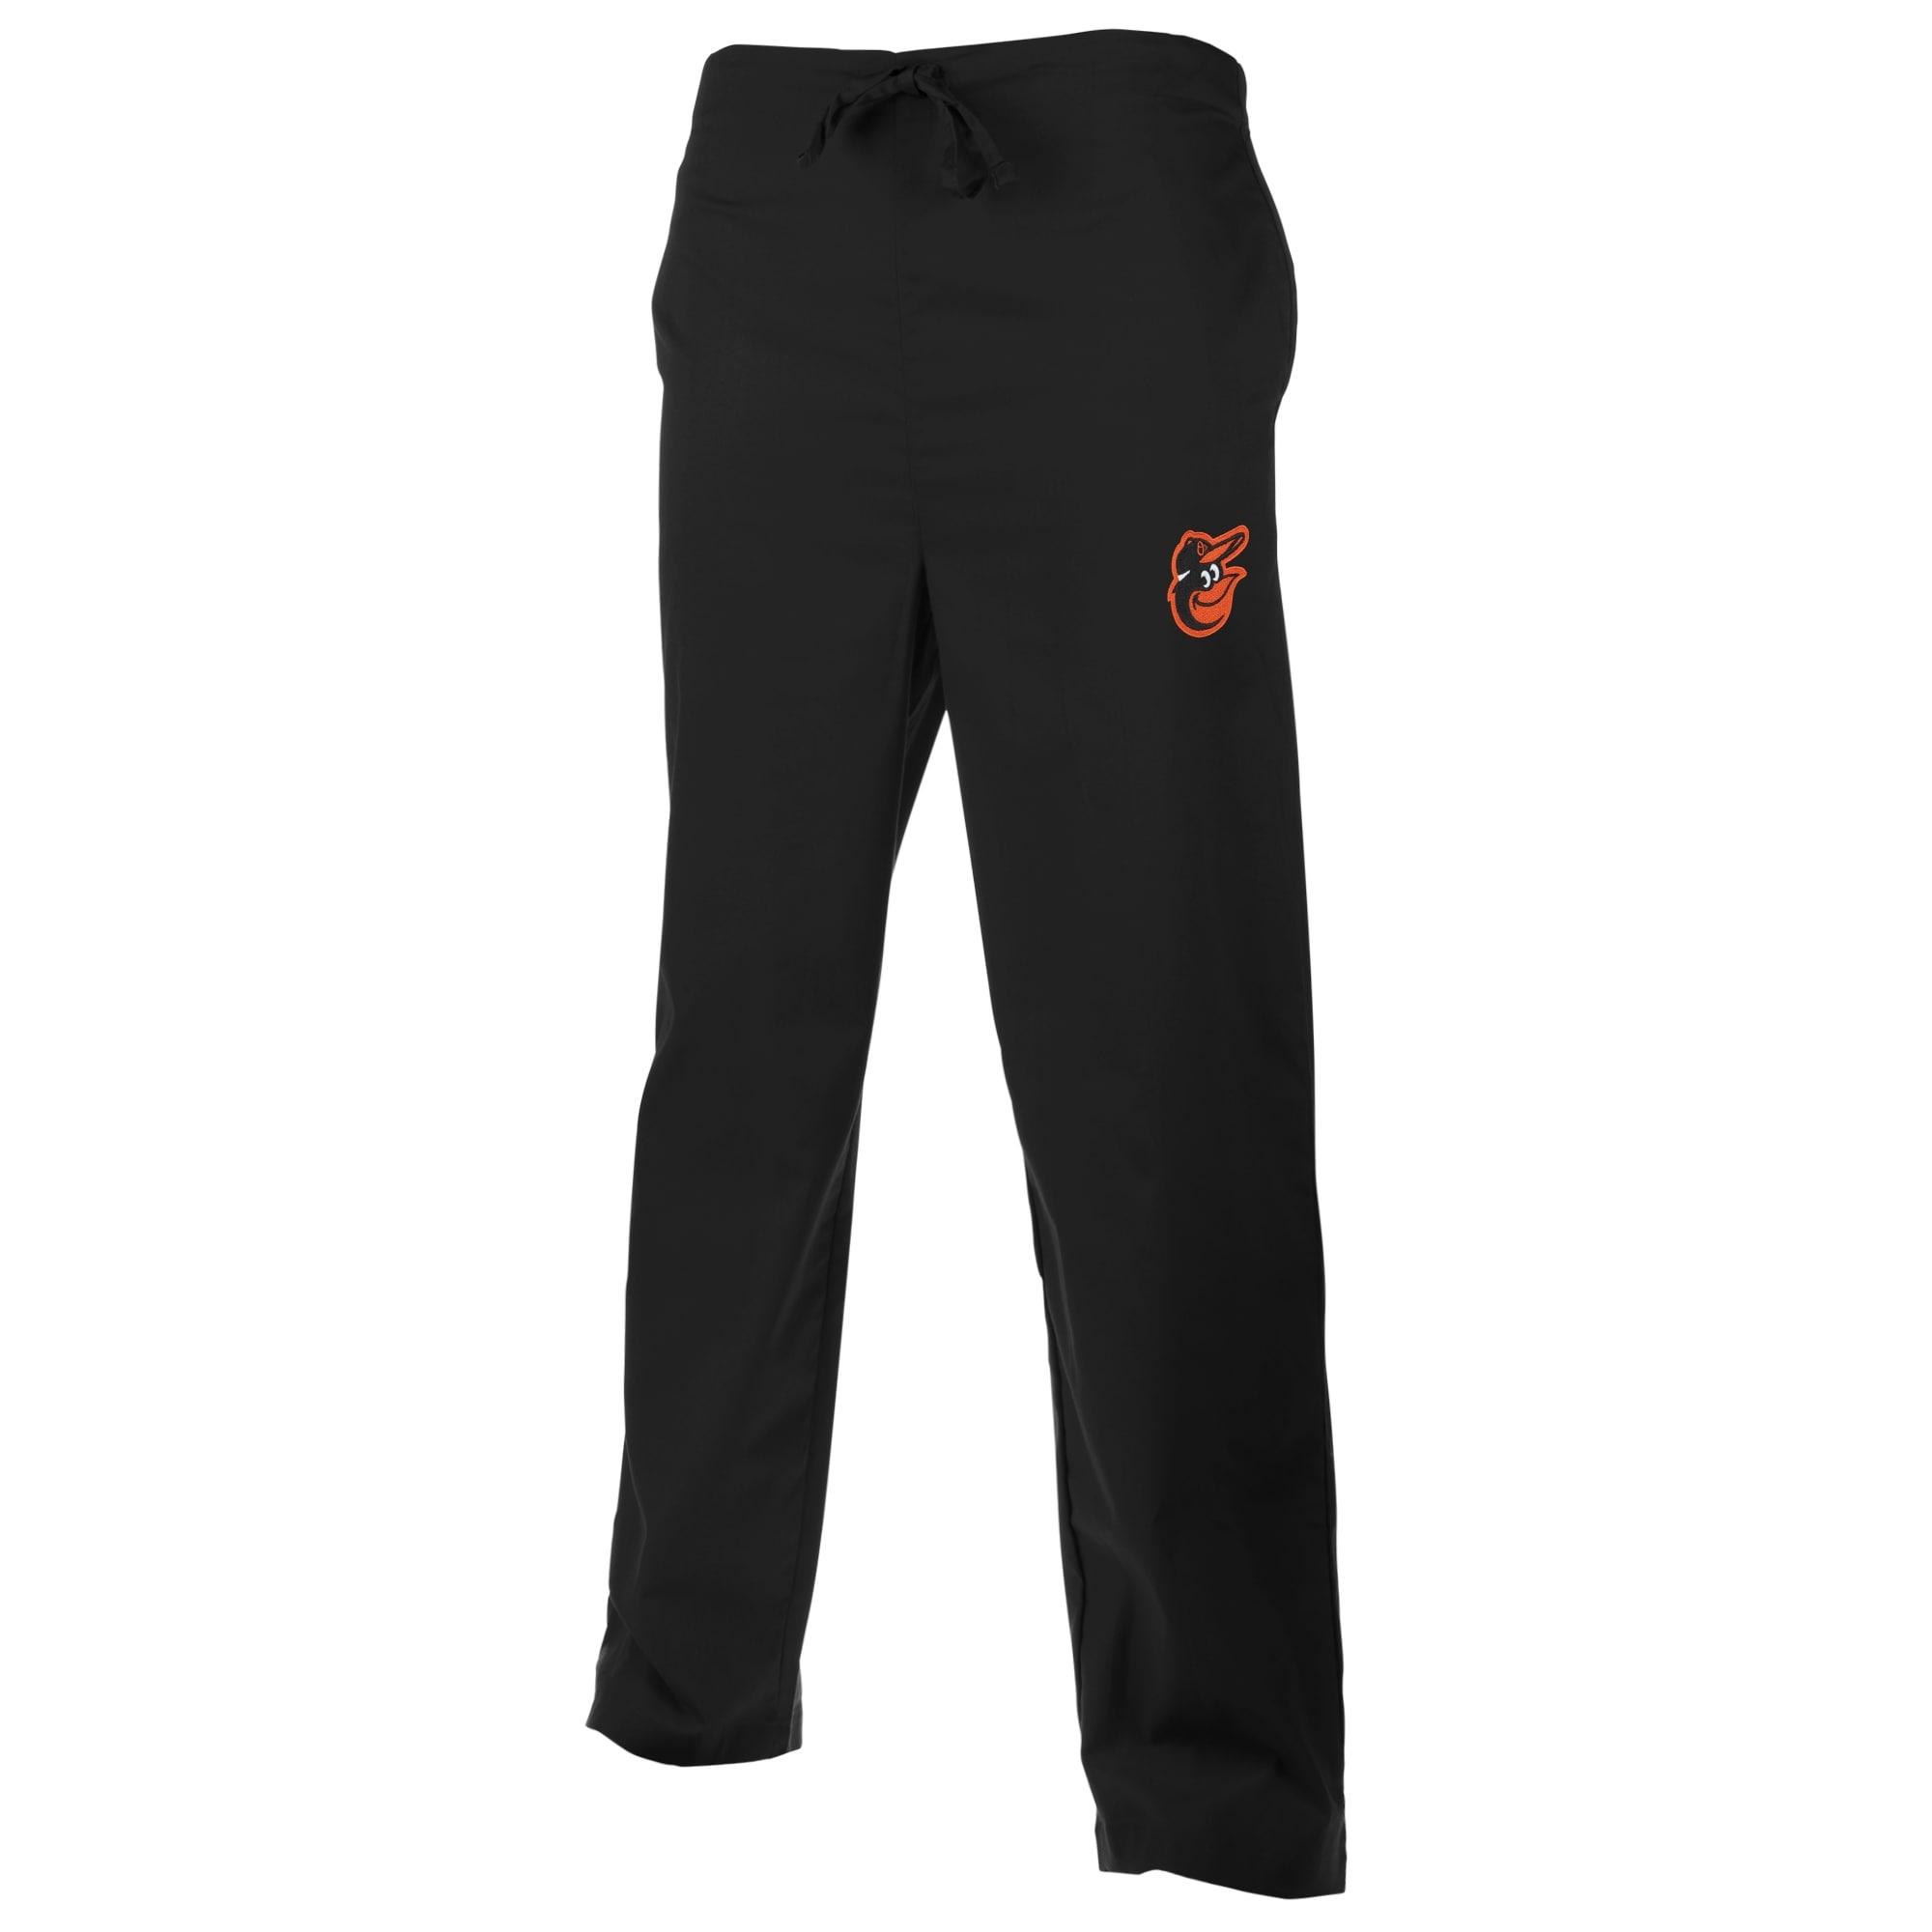 Baltimore Orioles Unisex Scrub Pants - Black